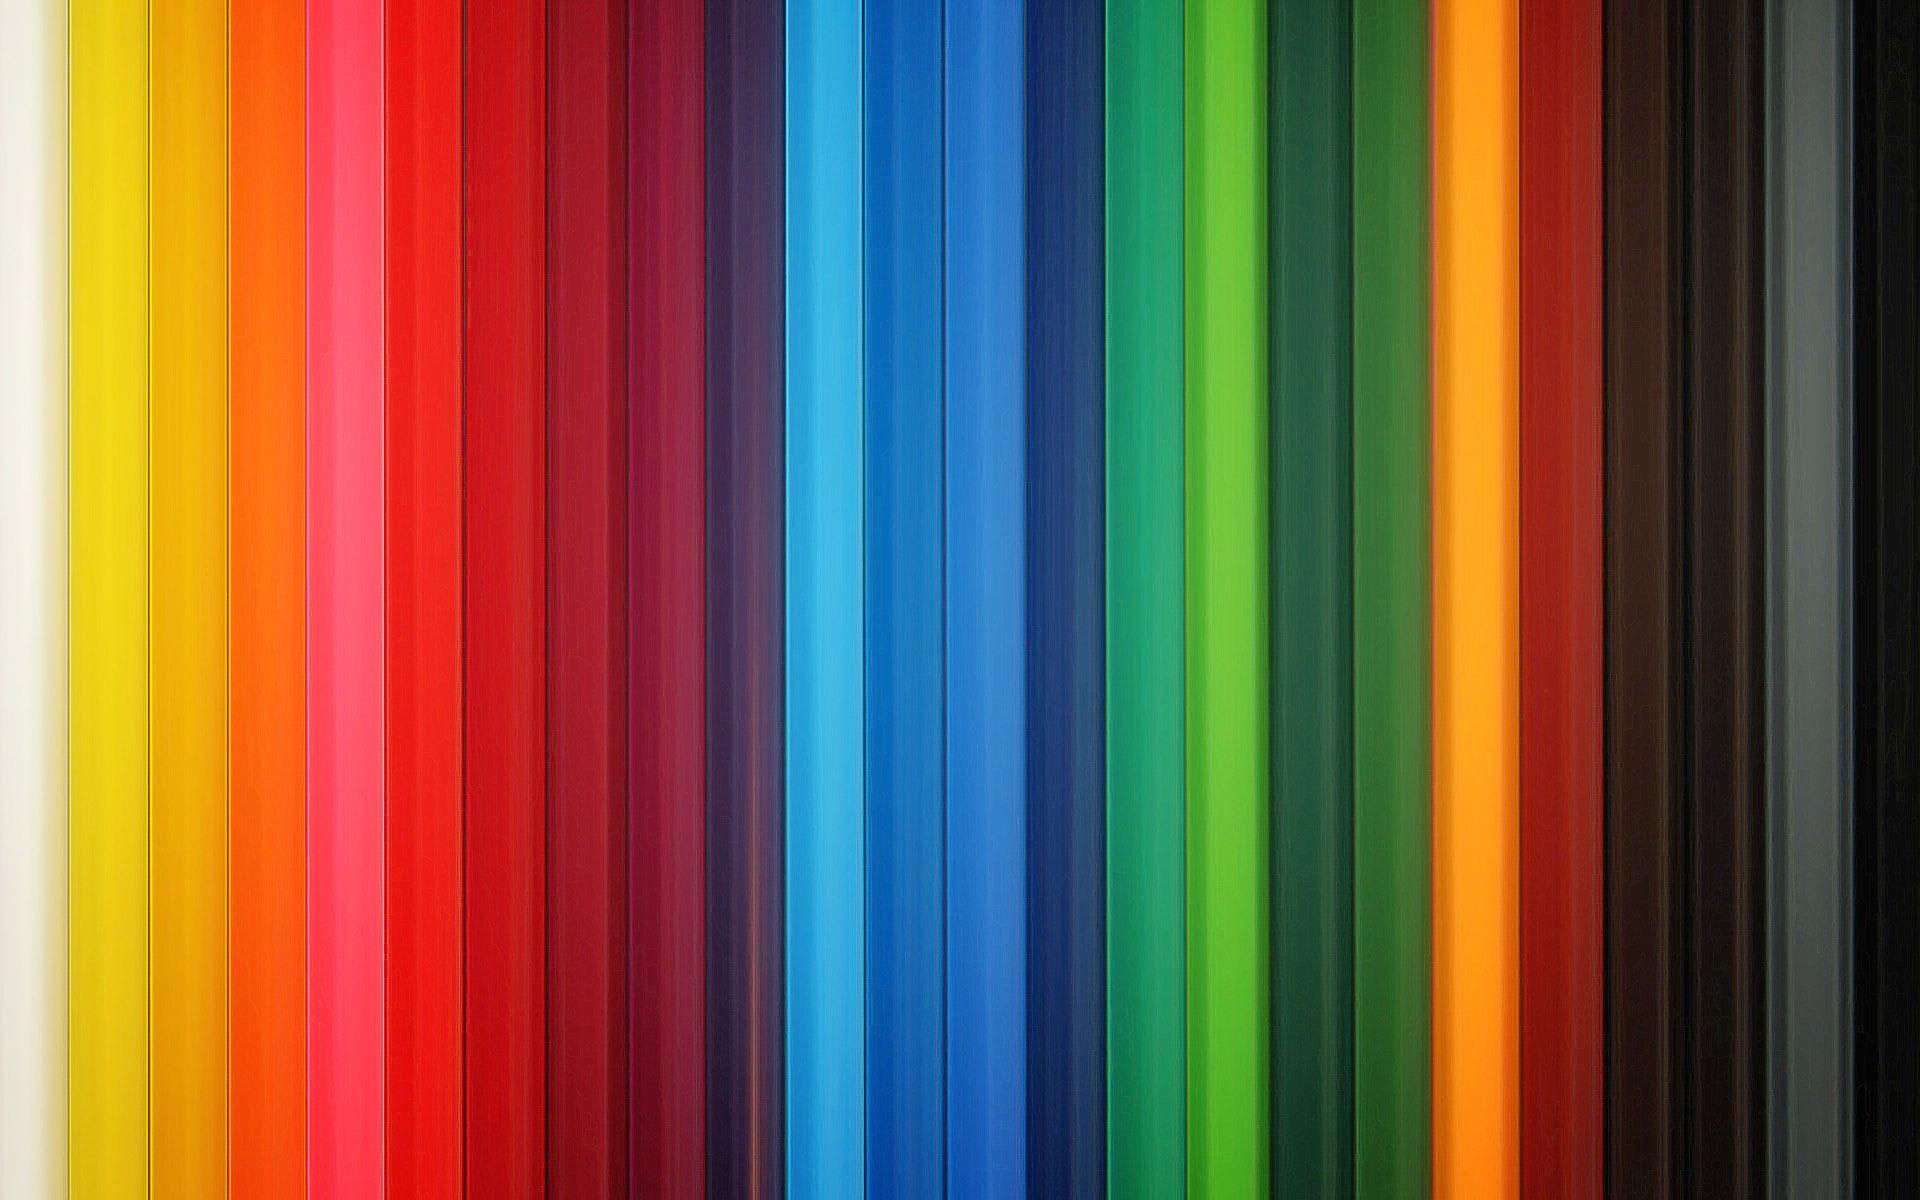 Color Stripes desktop wallpaper 1920x1200